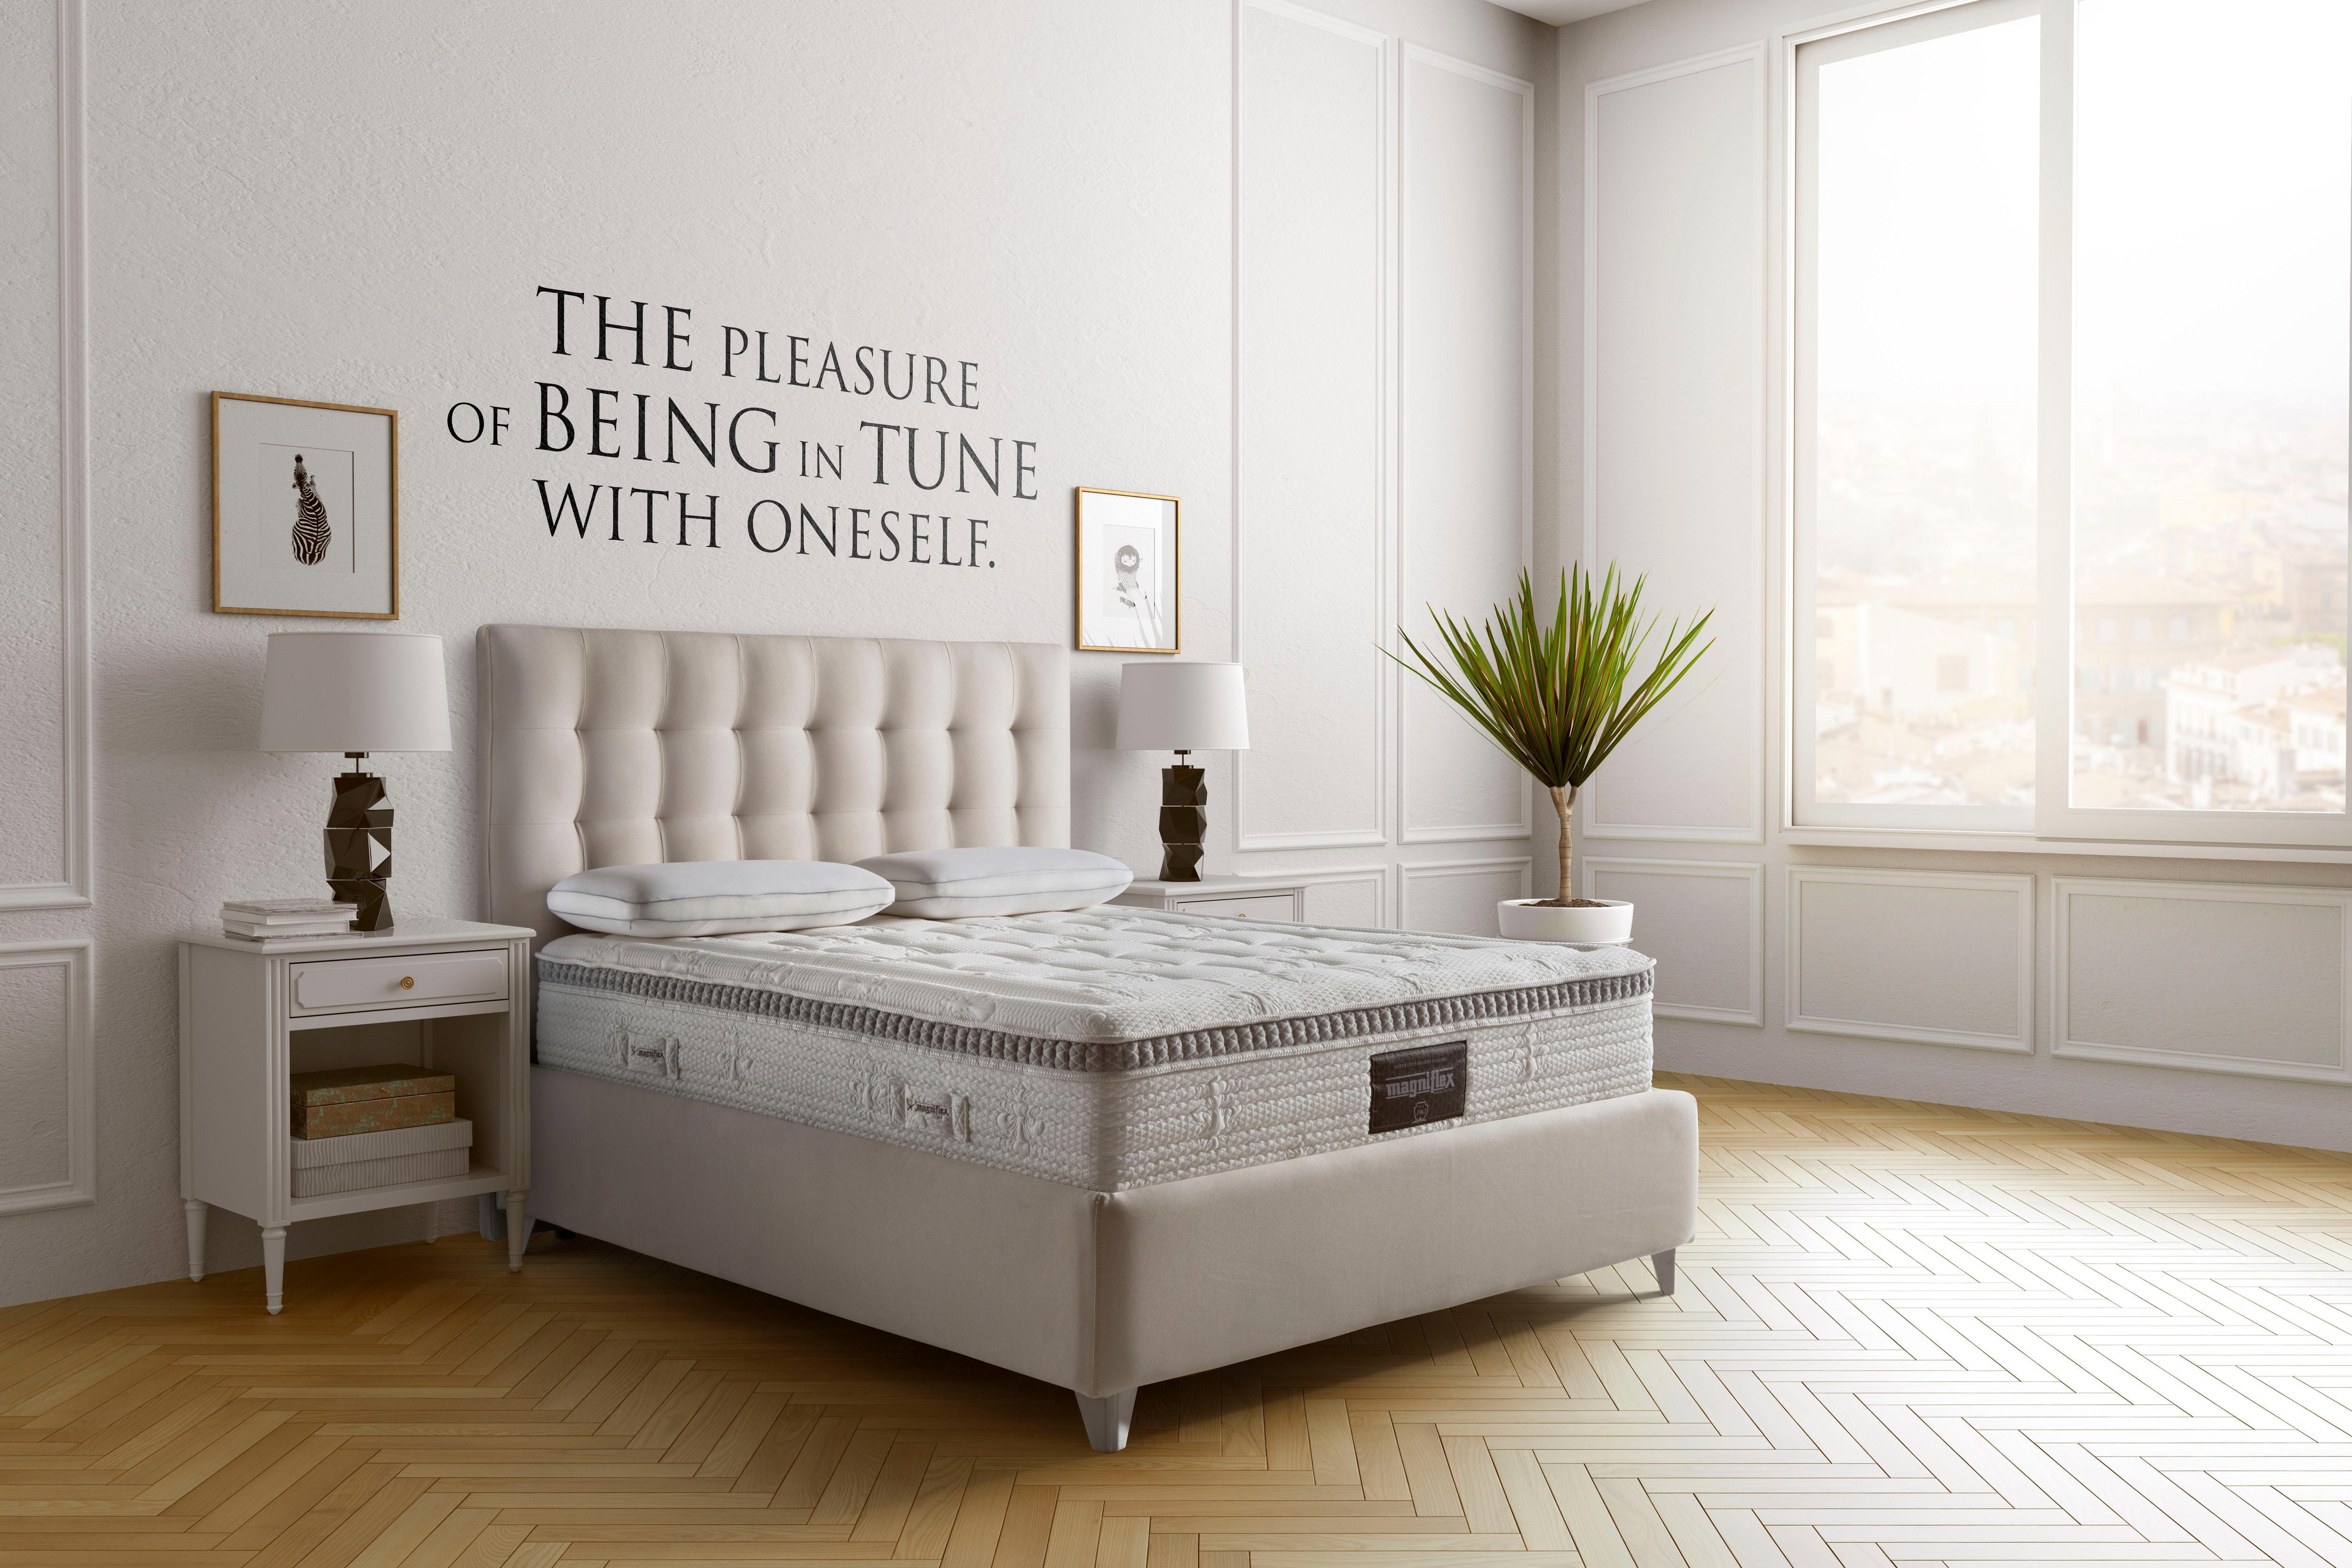 visco matratze armonia magnigel dual 12 magniflex 30 cm hoch bestellen baur. Black Bedroom Furniture Sets. Home Design Ideas